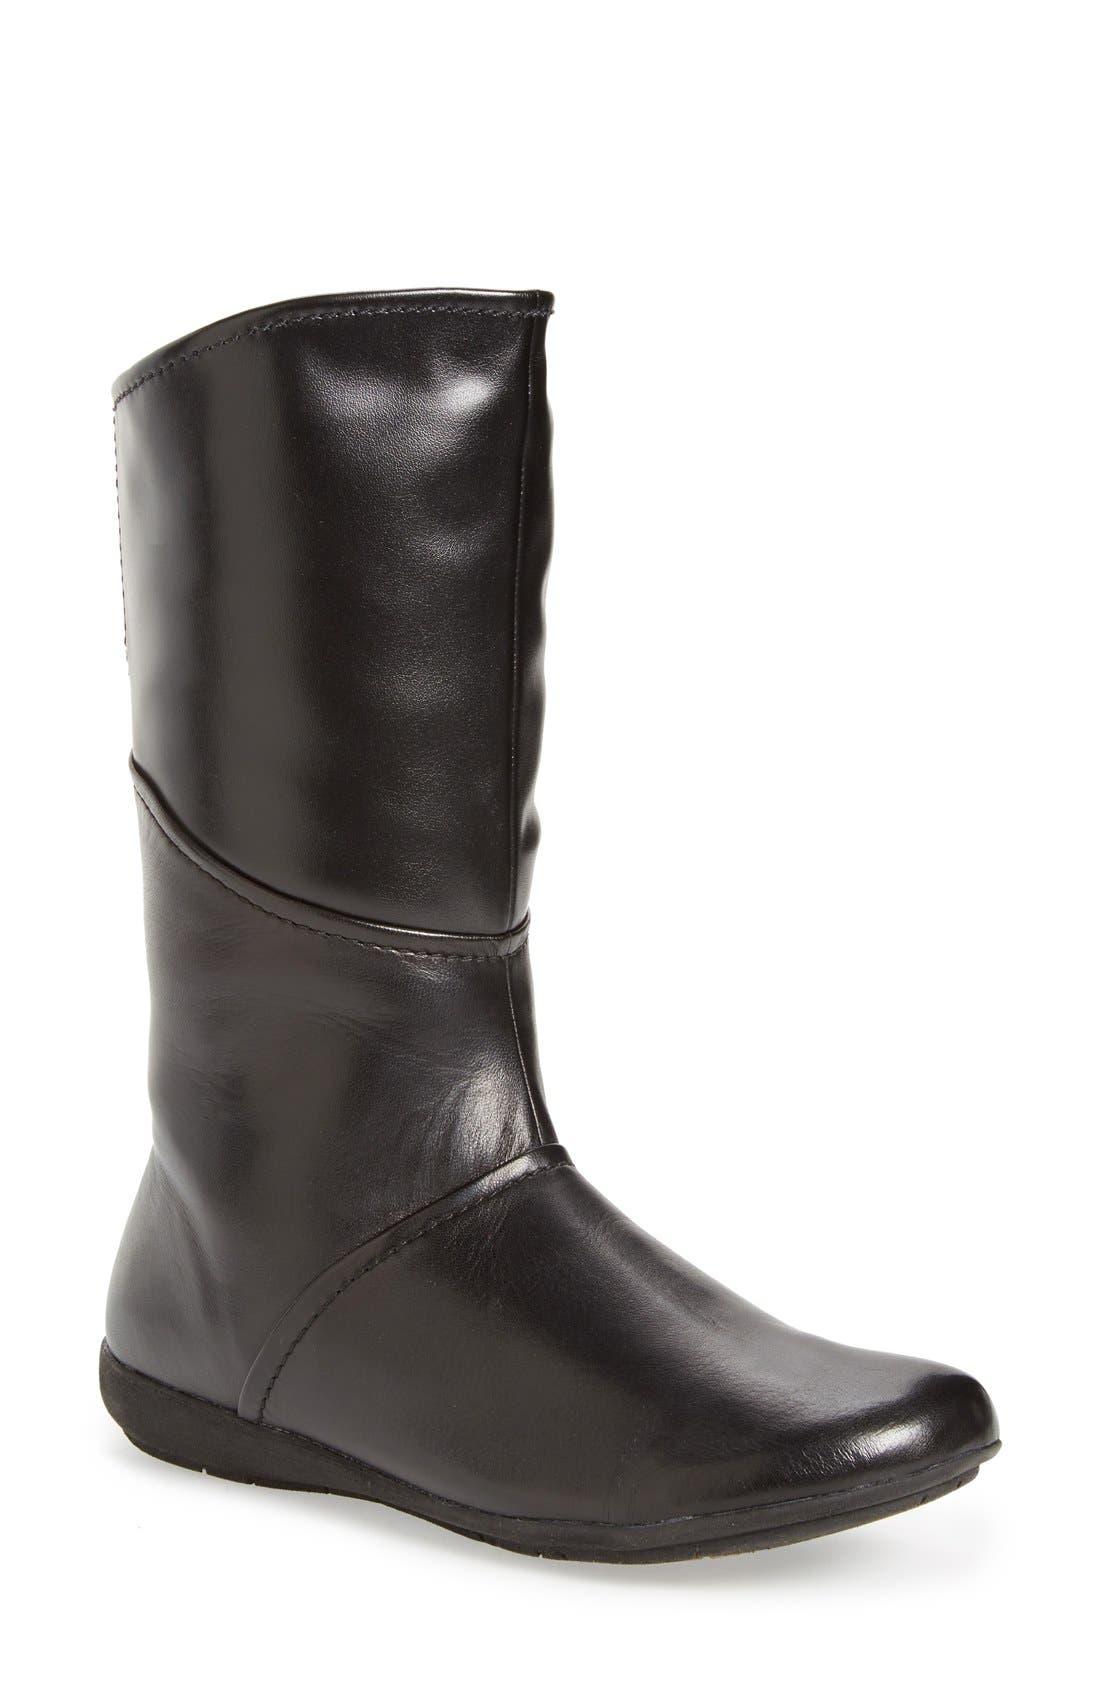 JOSEF SEIBEL 'Faye 53' Boot